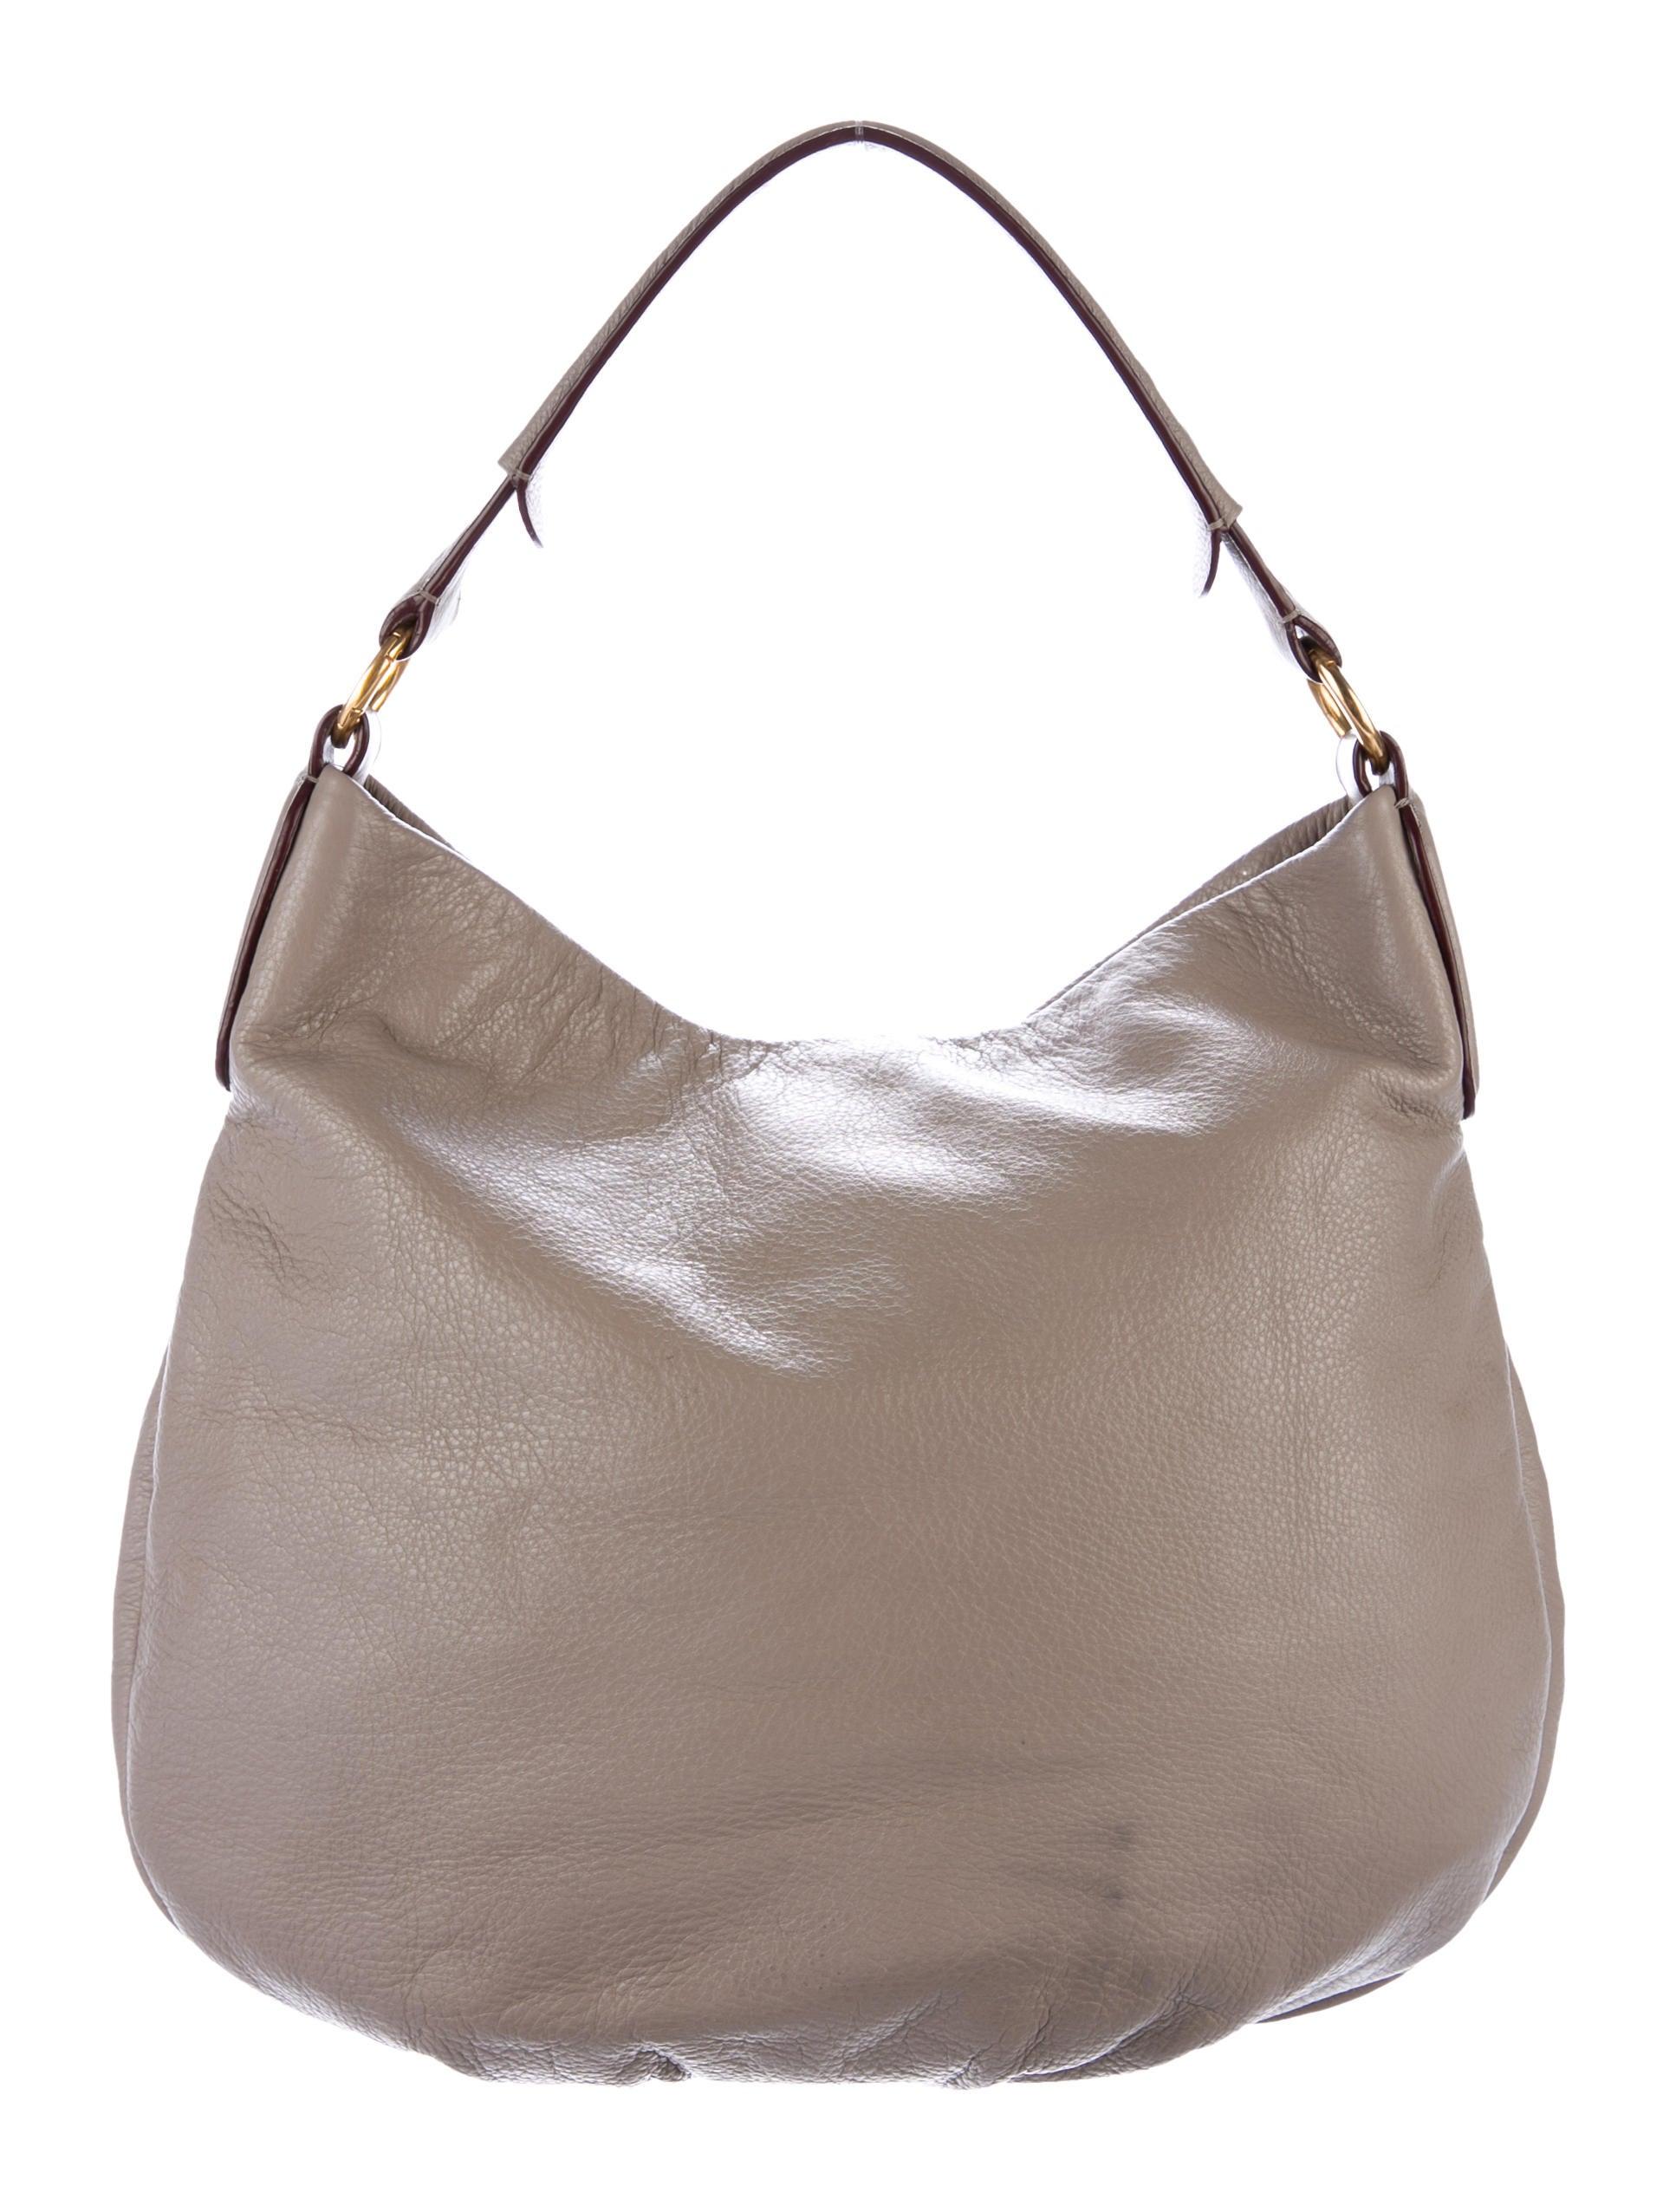 marc by marc jacobs pebbled leather hobo handbags. Black Bedroom Furniture Sets. Home Design Ideas